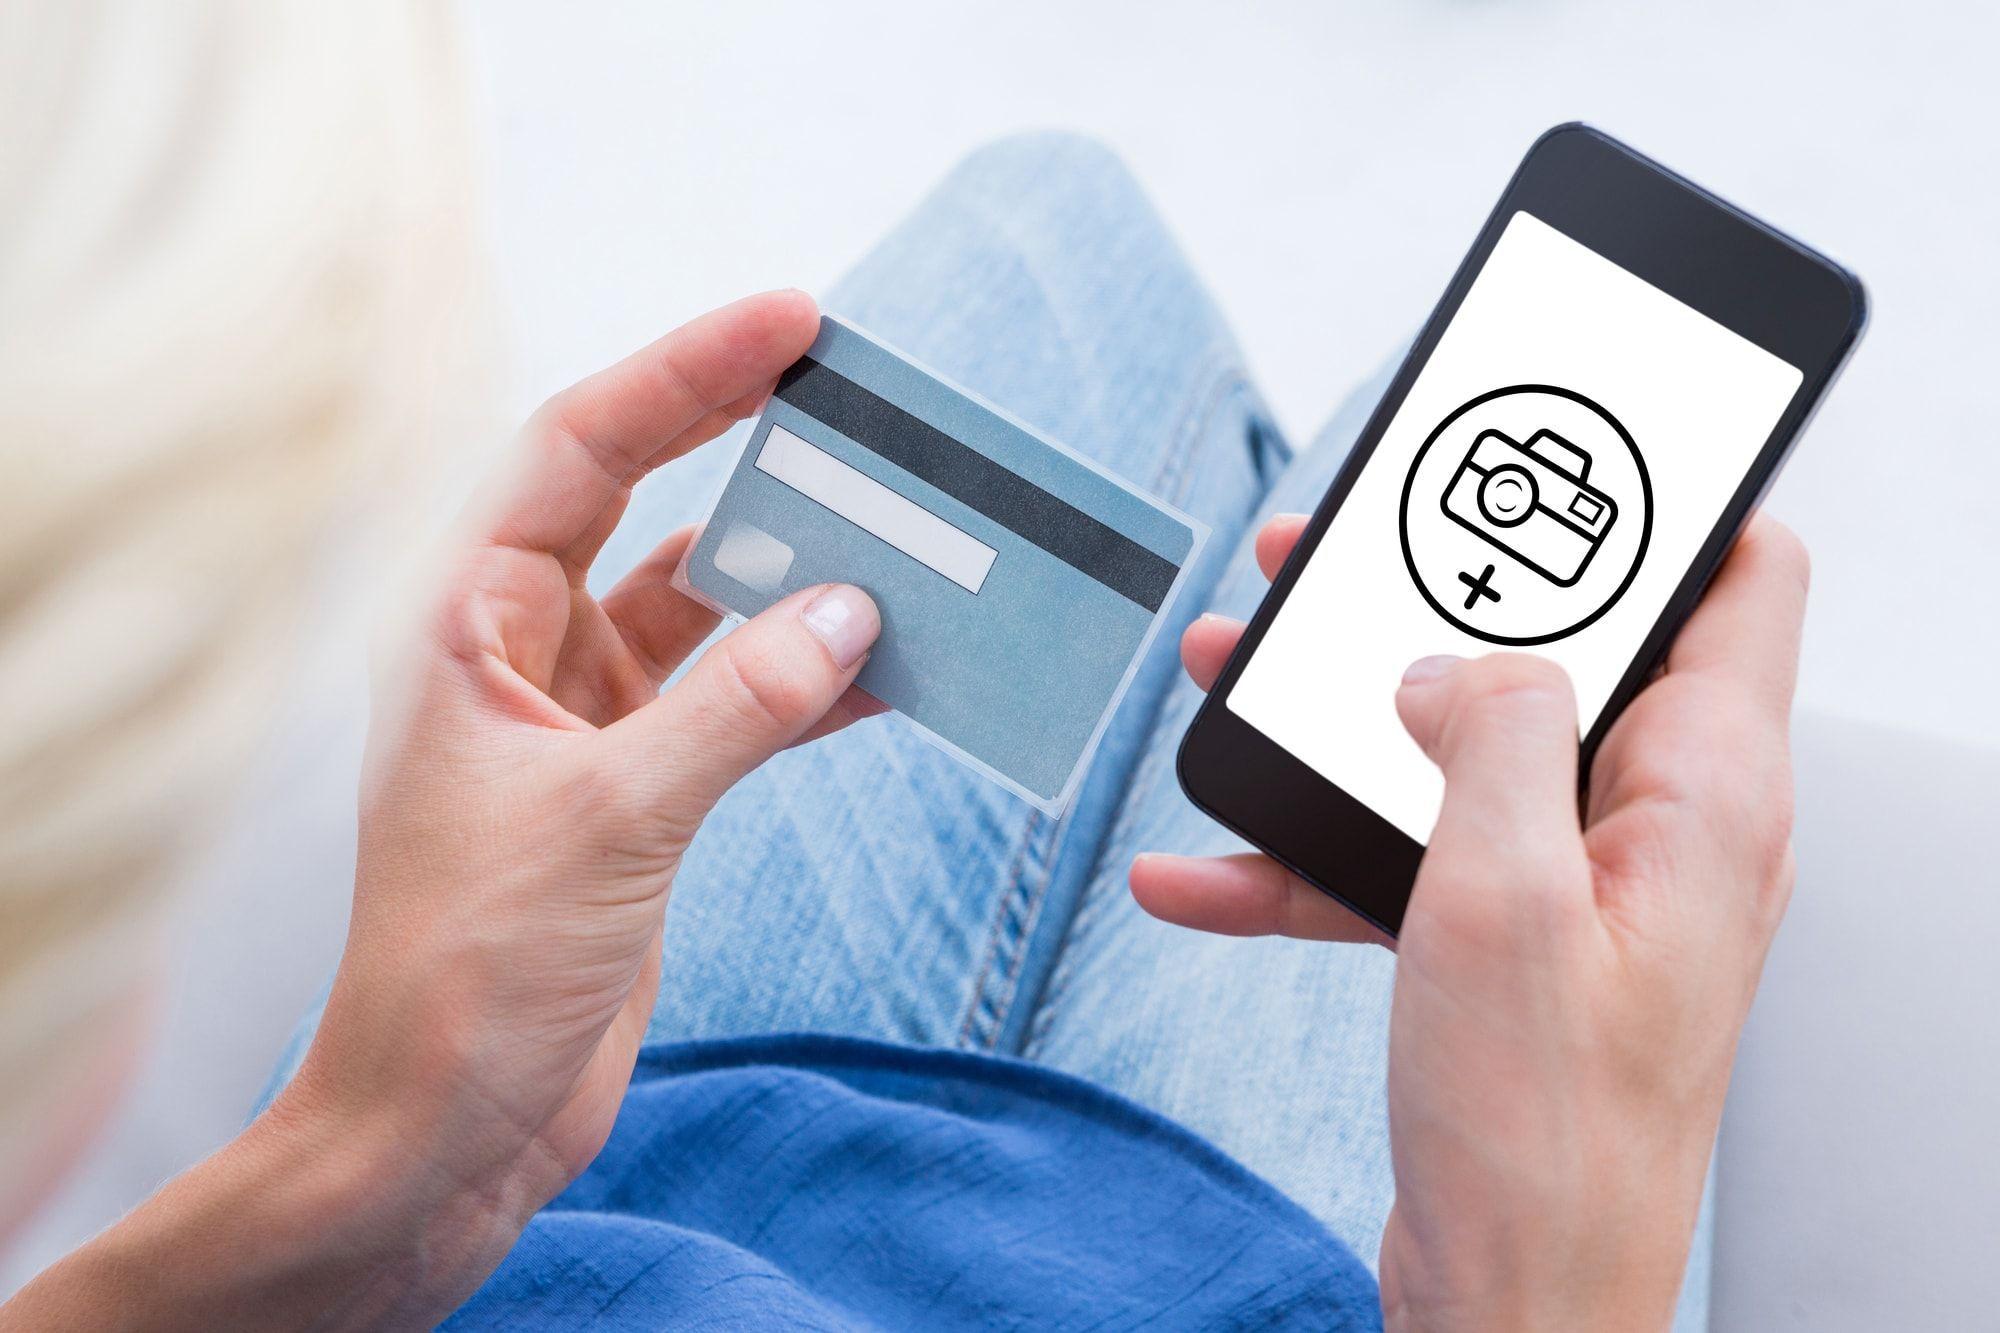 iPhoneにクレジットカード情報を登録する方法や注意点を解説